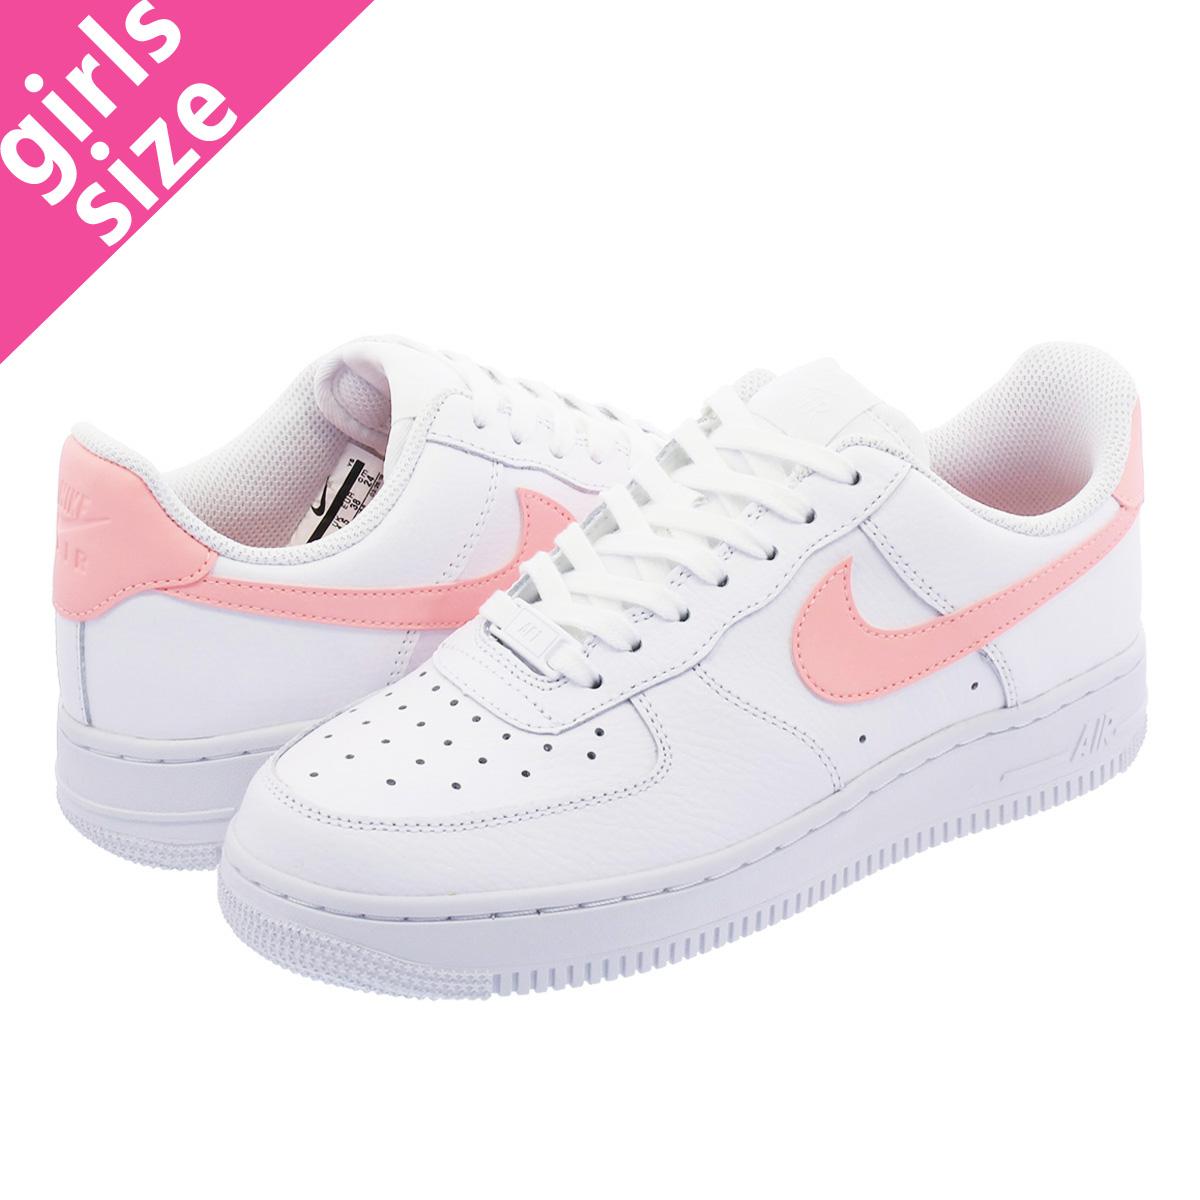 65f60616 NIKE WMNS AIR FORCE 1 07 Nike women air force 1 07 WHITE/ORACLE PINK/WHITE  ah0287-102-l